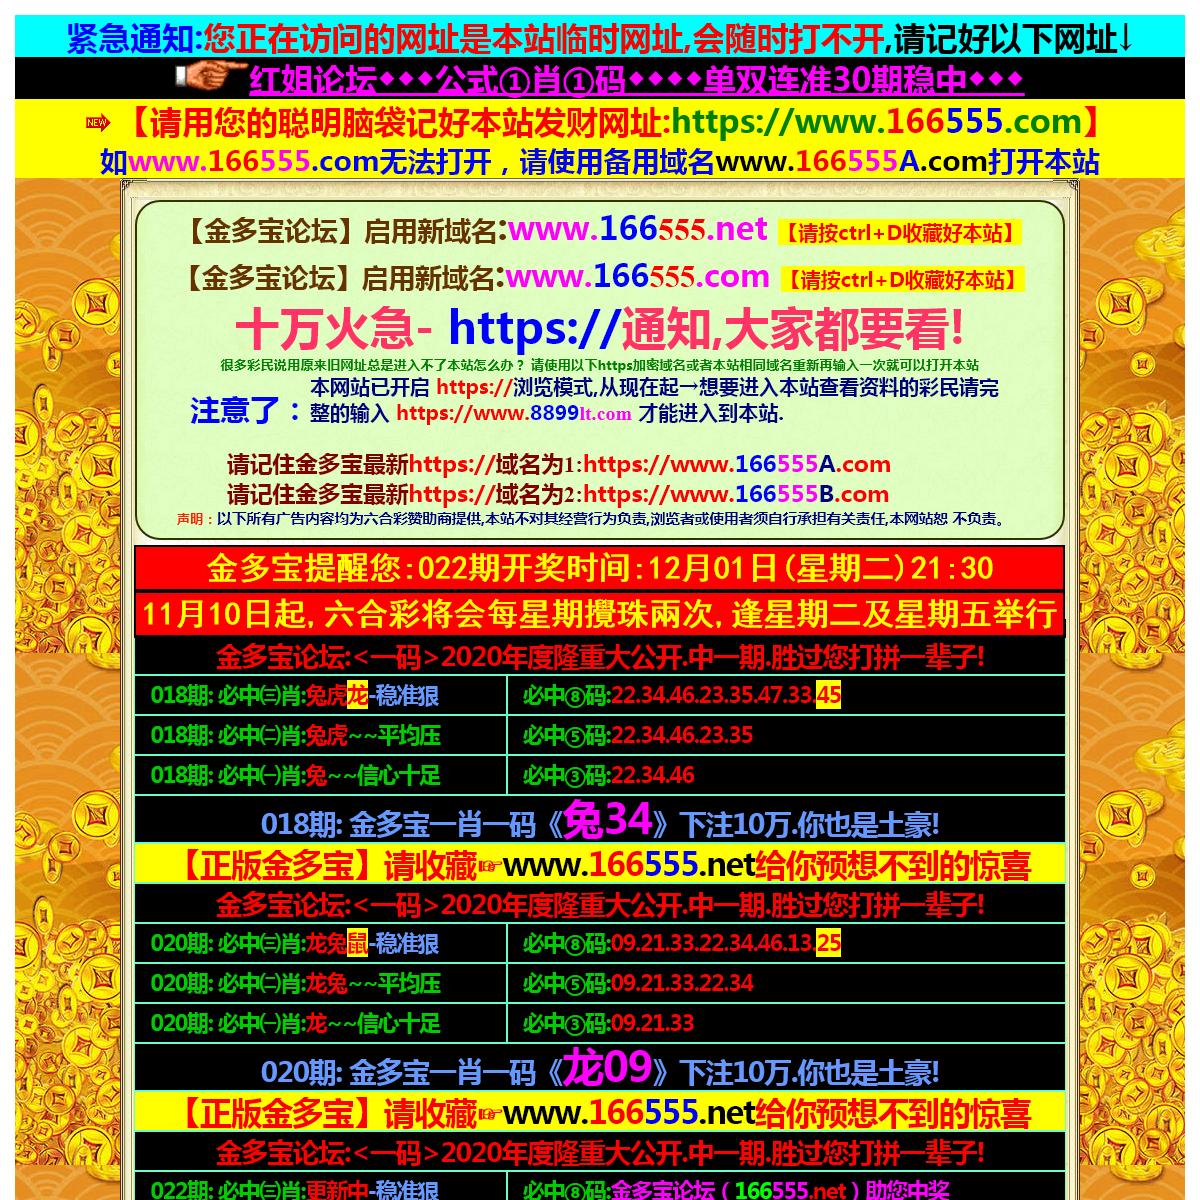 www.23908.com,六合宝典高手坛,济民救世报,今日是什么生肖相冲,香港赛马会主页